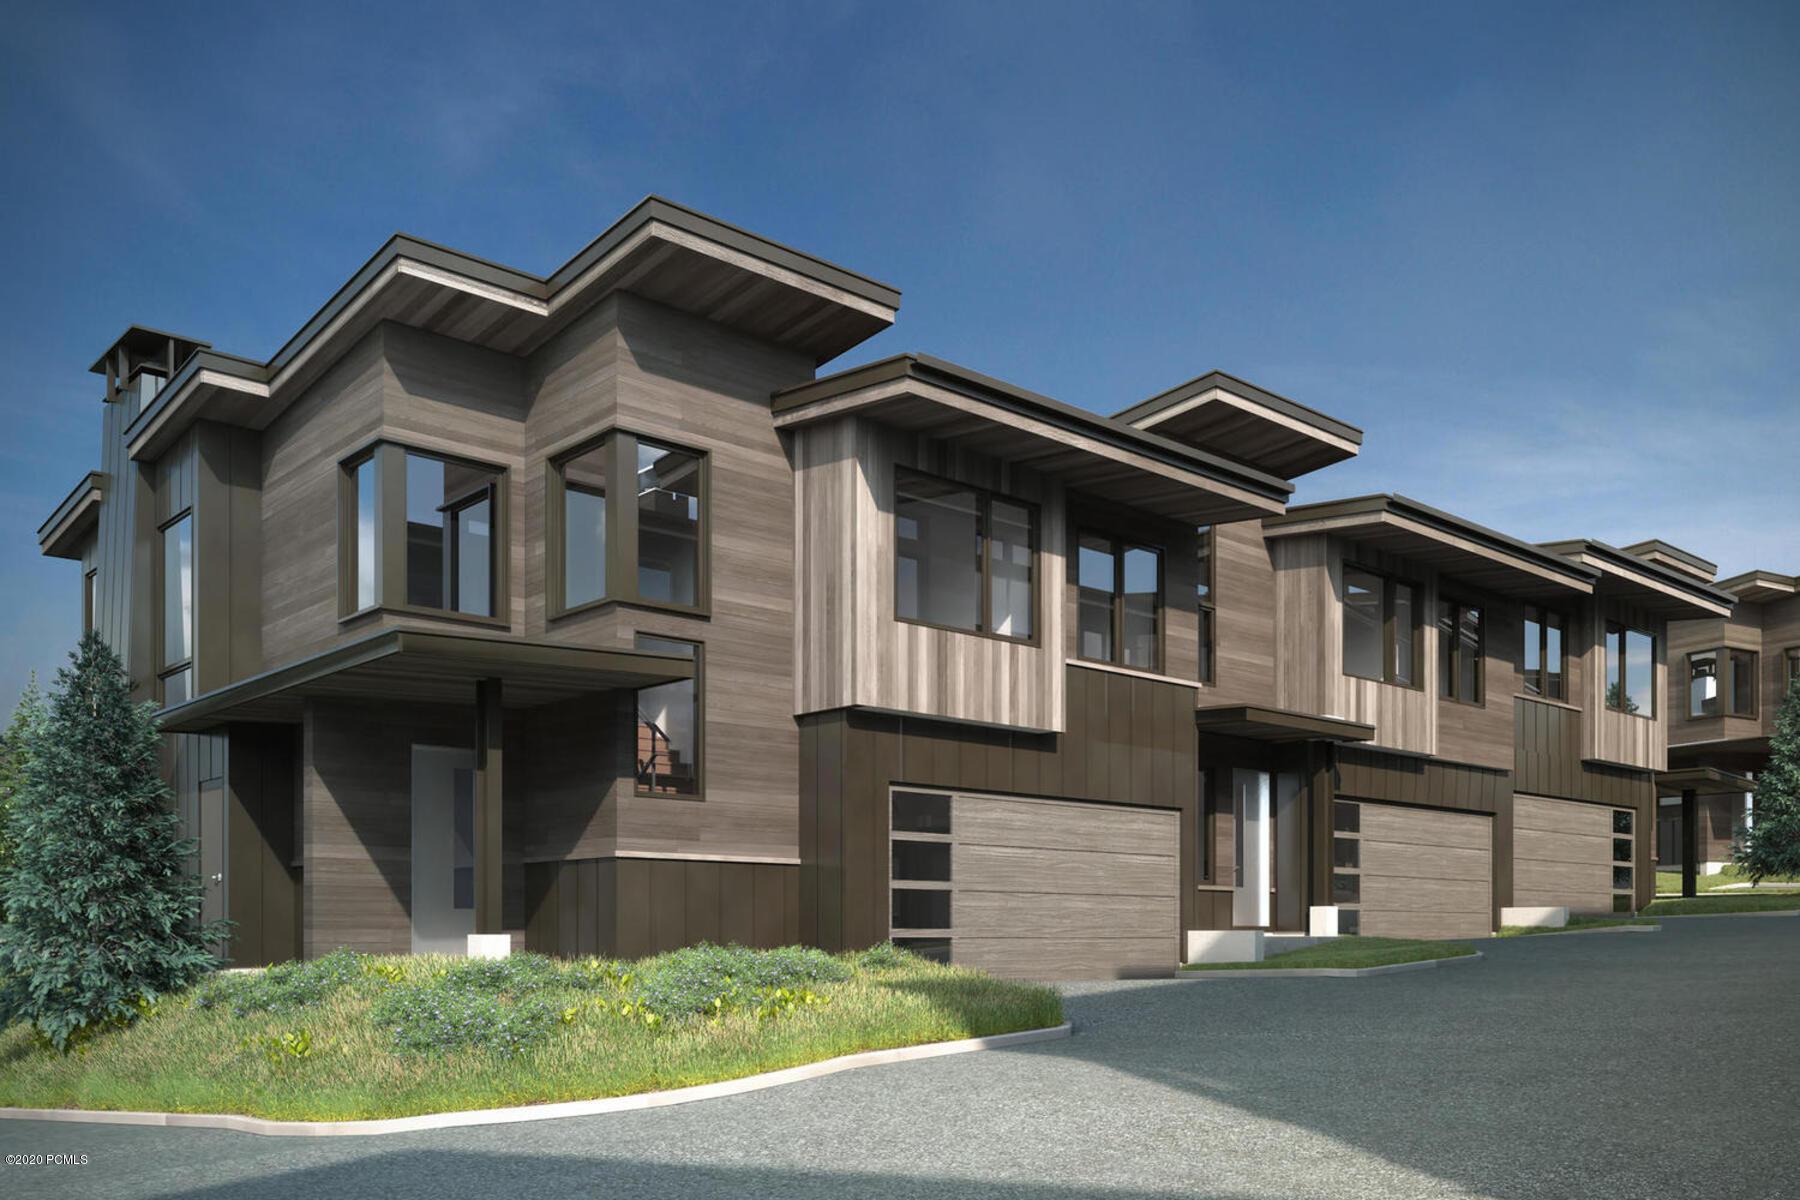 3548 Ridgeline Drive, Park City, Utah 84098, 4 Bedrooms Bedrooms, ,5 BathroomsBathrooms,Condominium,For Sale,Ridgeline,12003521